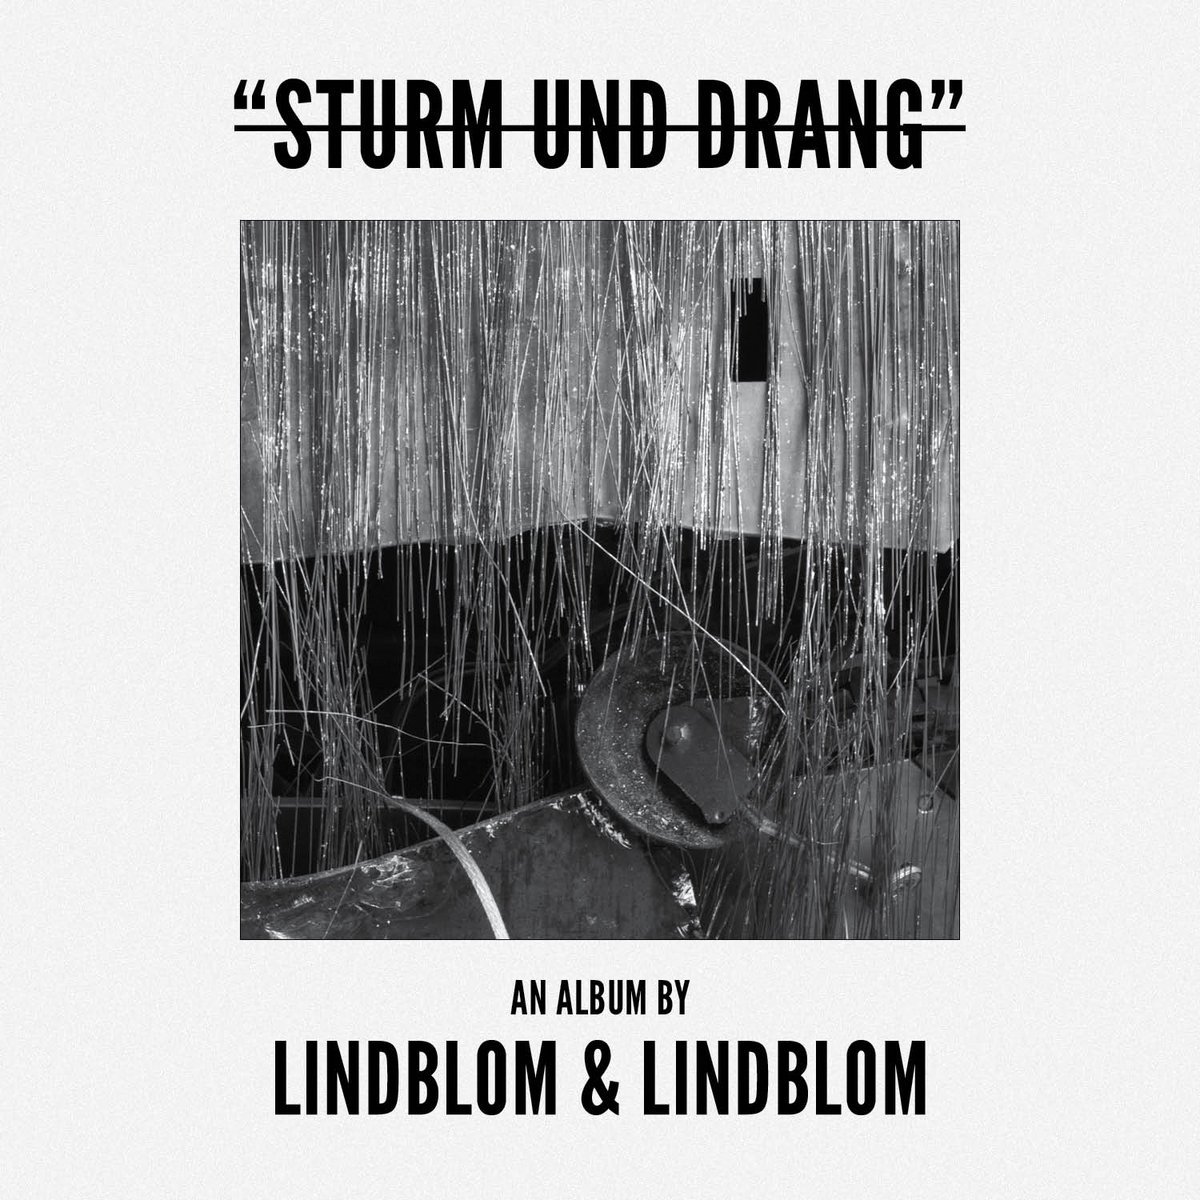 Lindblom & Lindblom